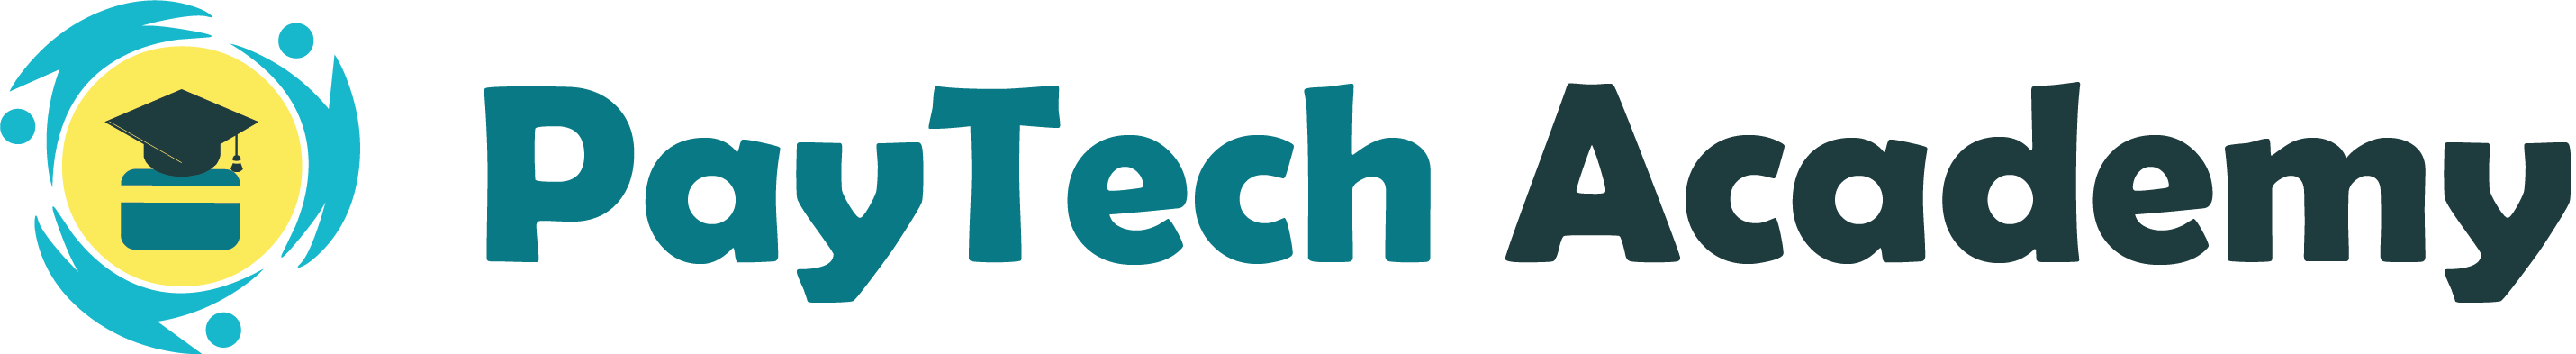 PayTech Academy